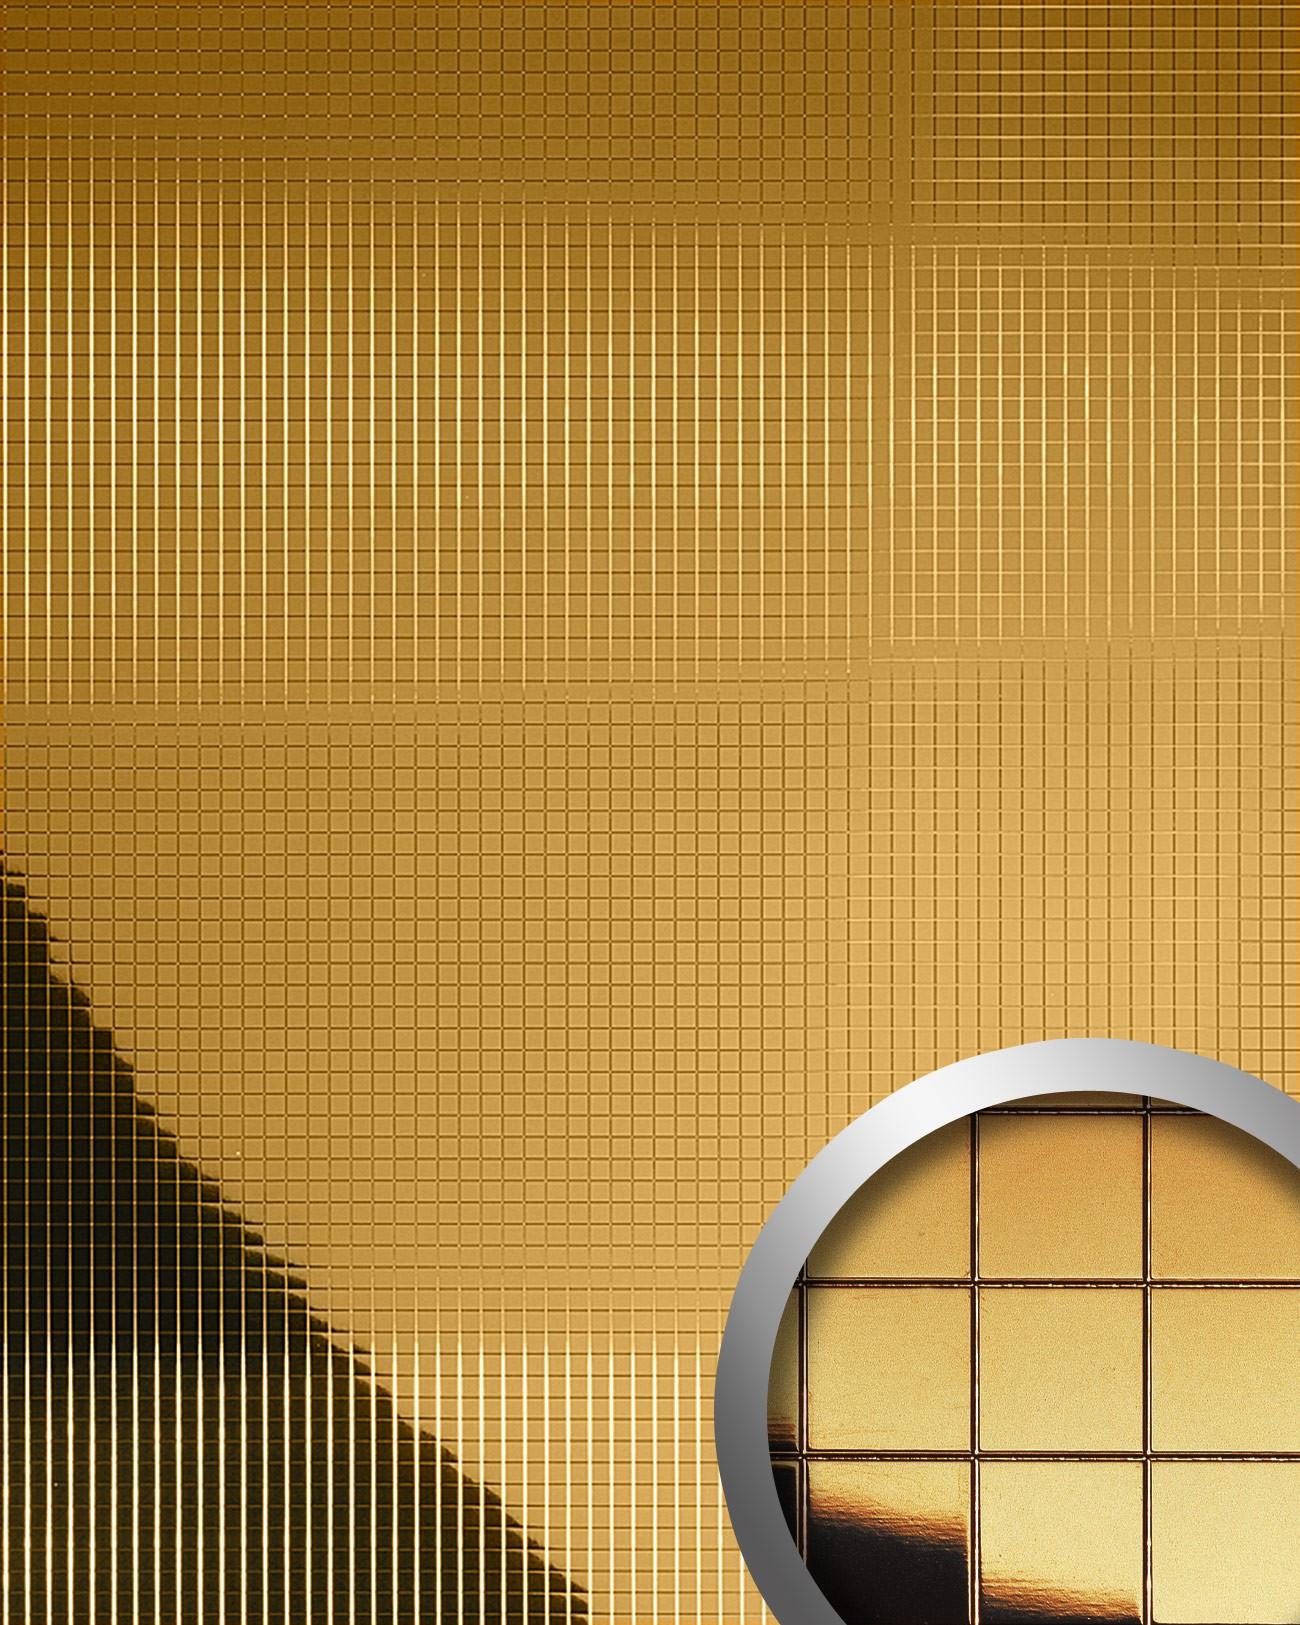 Wandpaneel Wandverkleidung WallFace MStyle Design Blickfang - Wandpaneele auf fliesen kleben